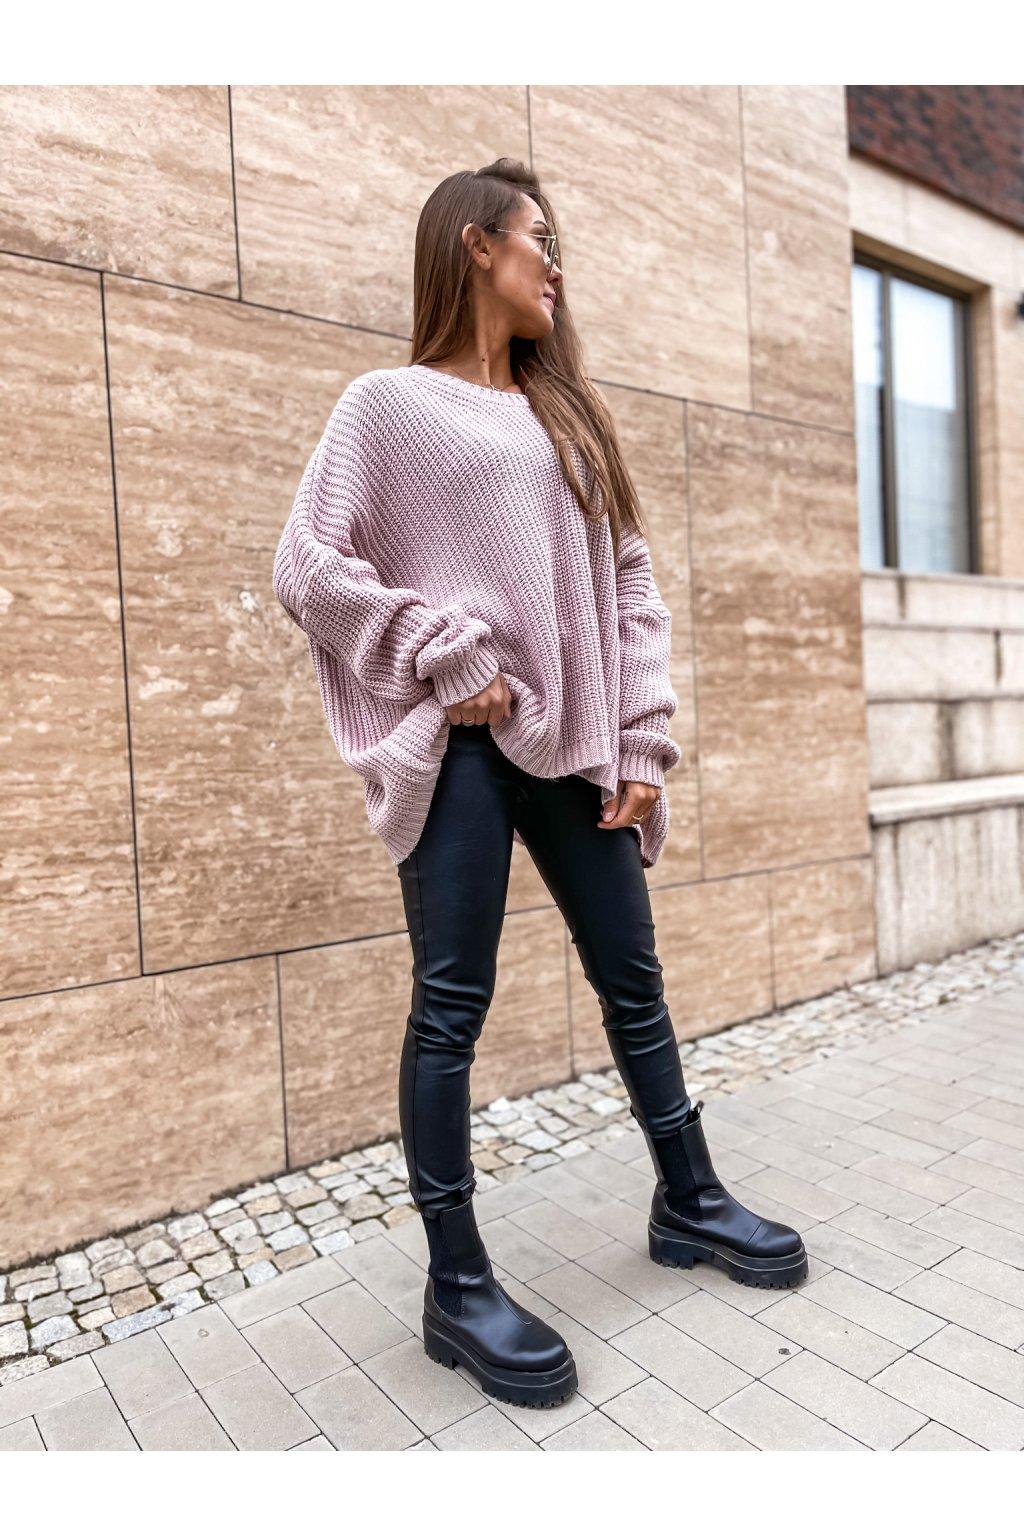 damsky oversize svetr annie powder pink eshopat cz 1